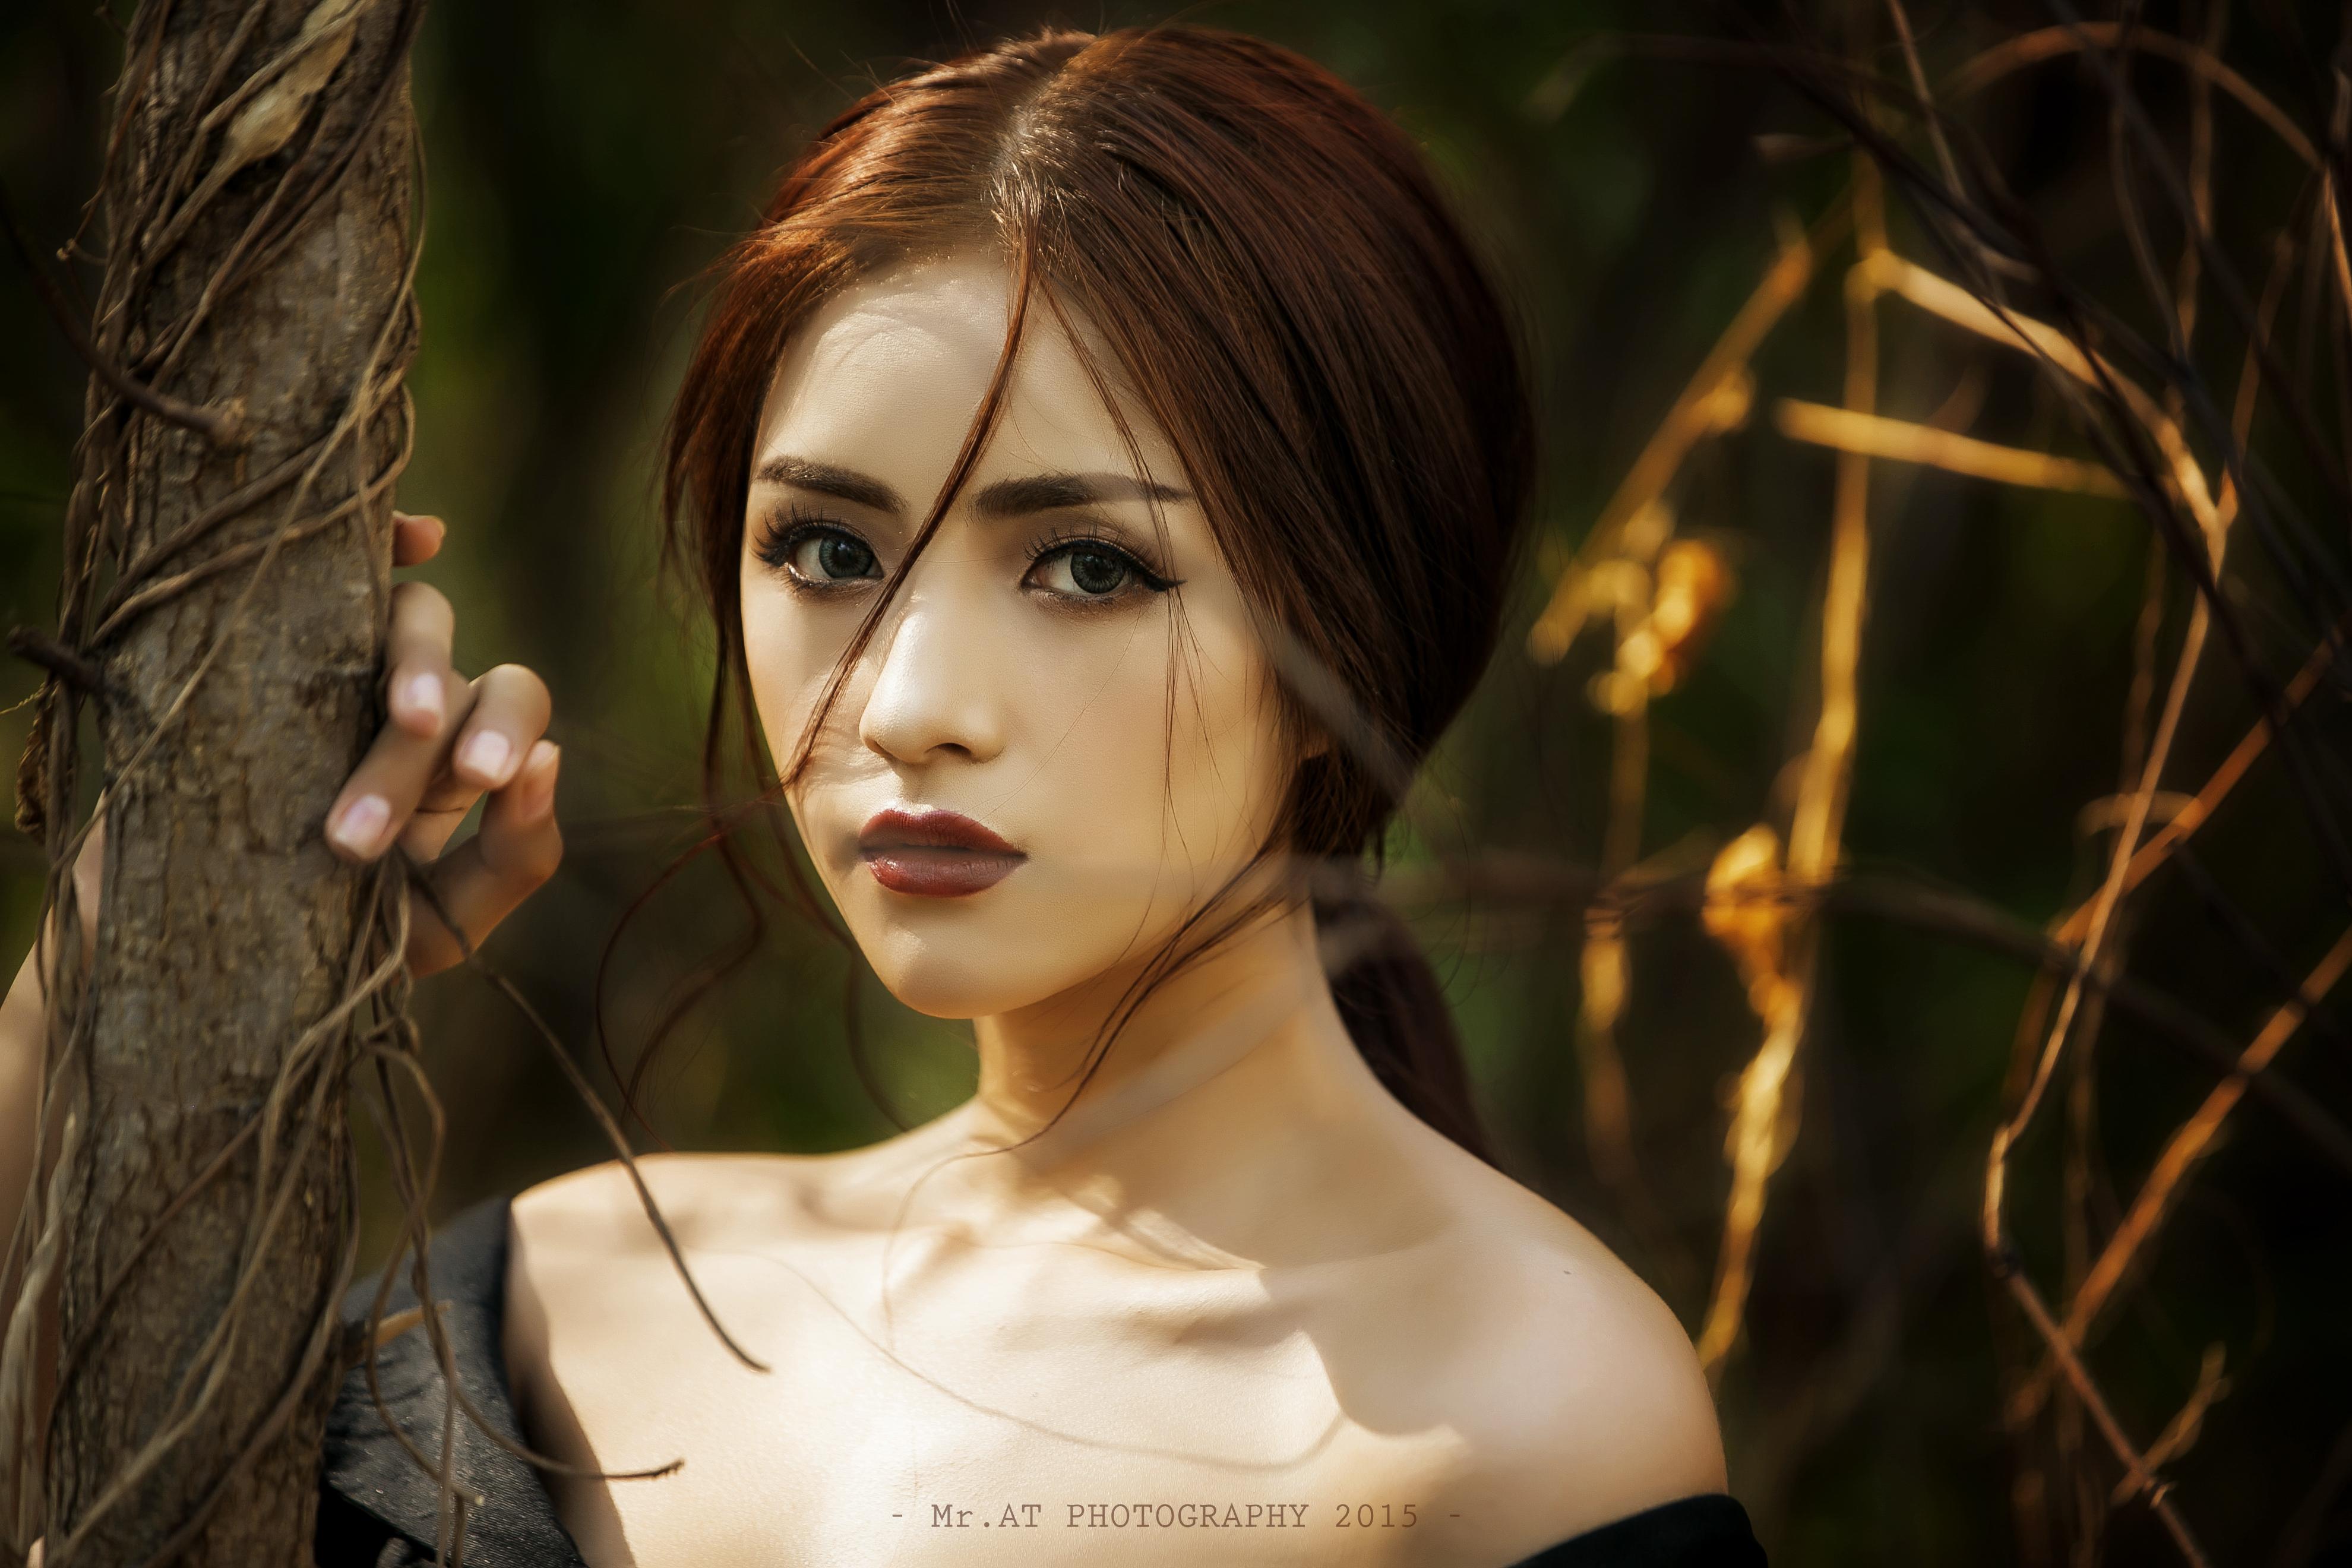 Mai nh quy n 4k ultra hd wallpaper background image - Asian girl 4k ...